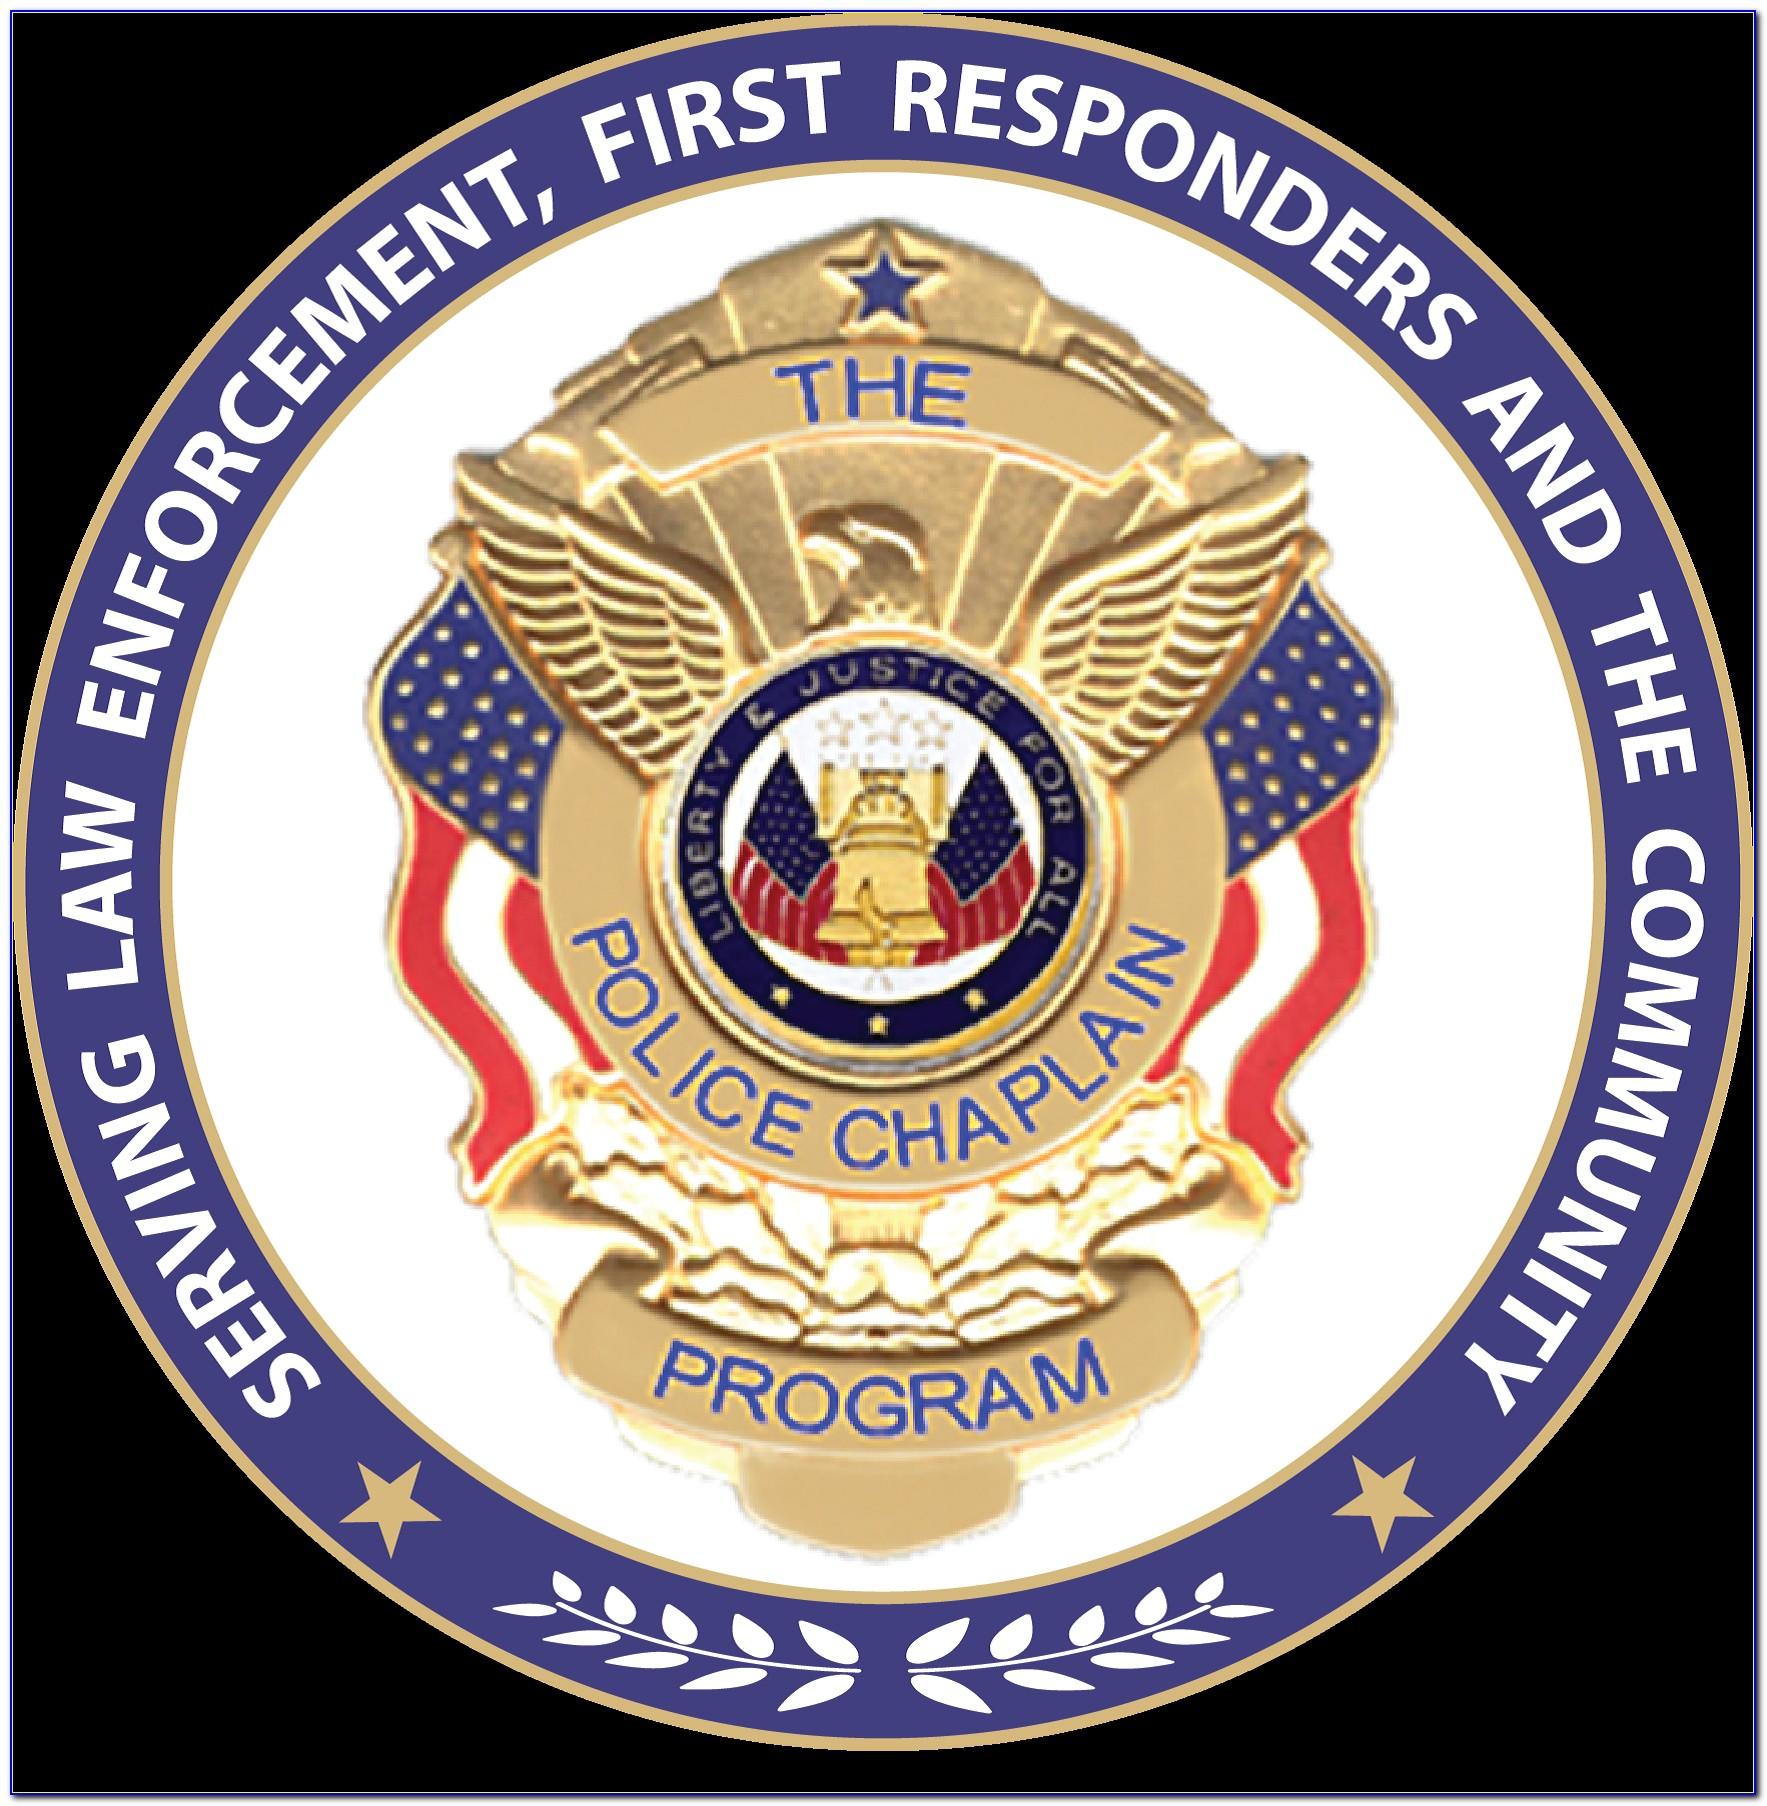 Certified Chaplain Programs Online